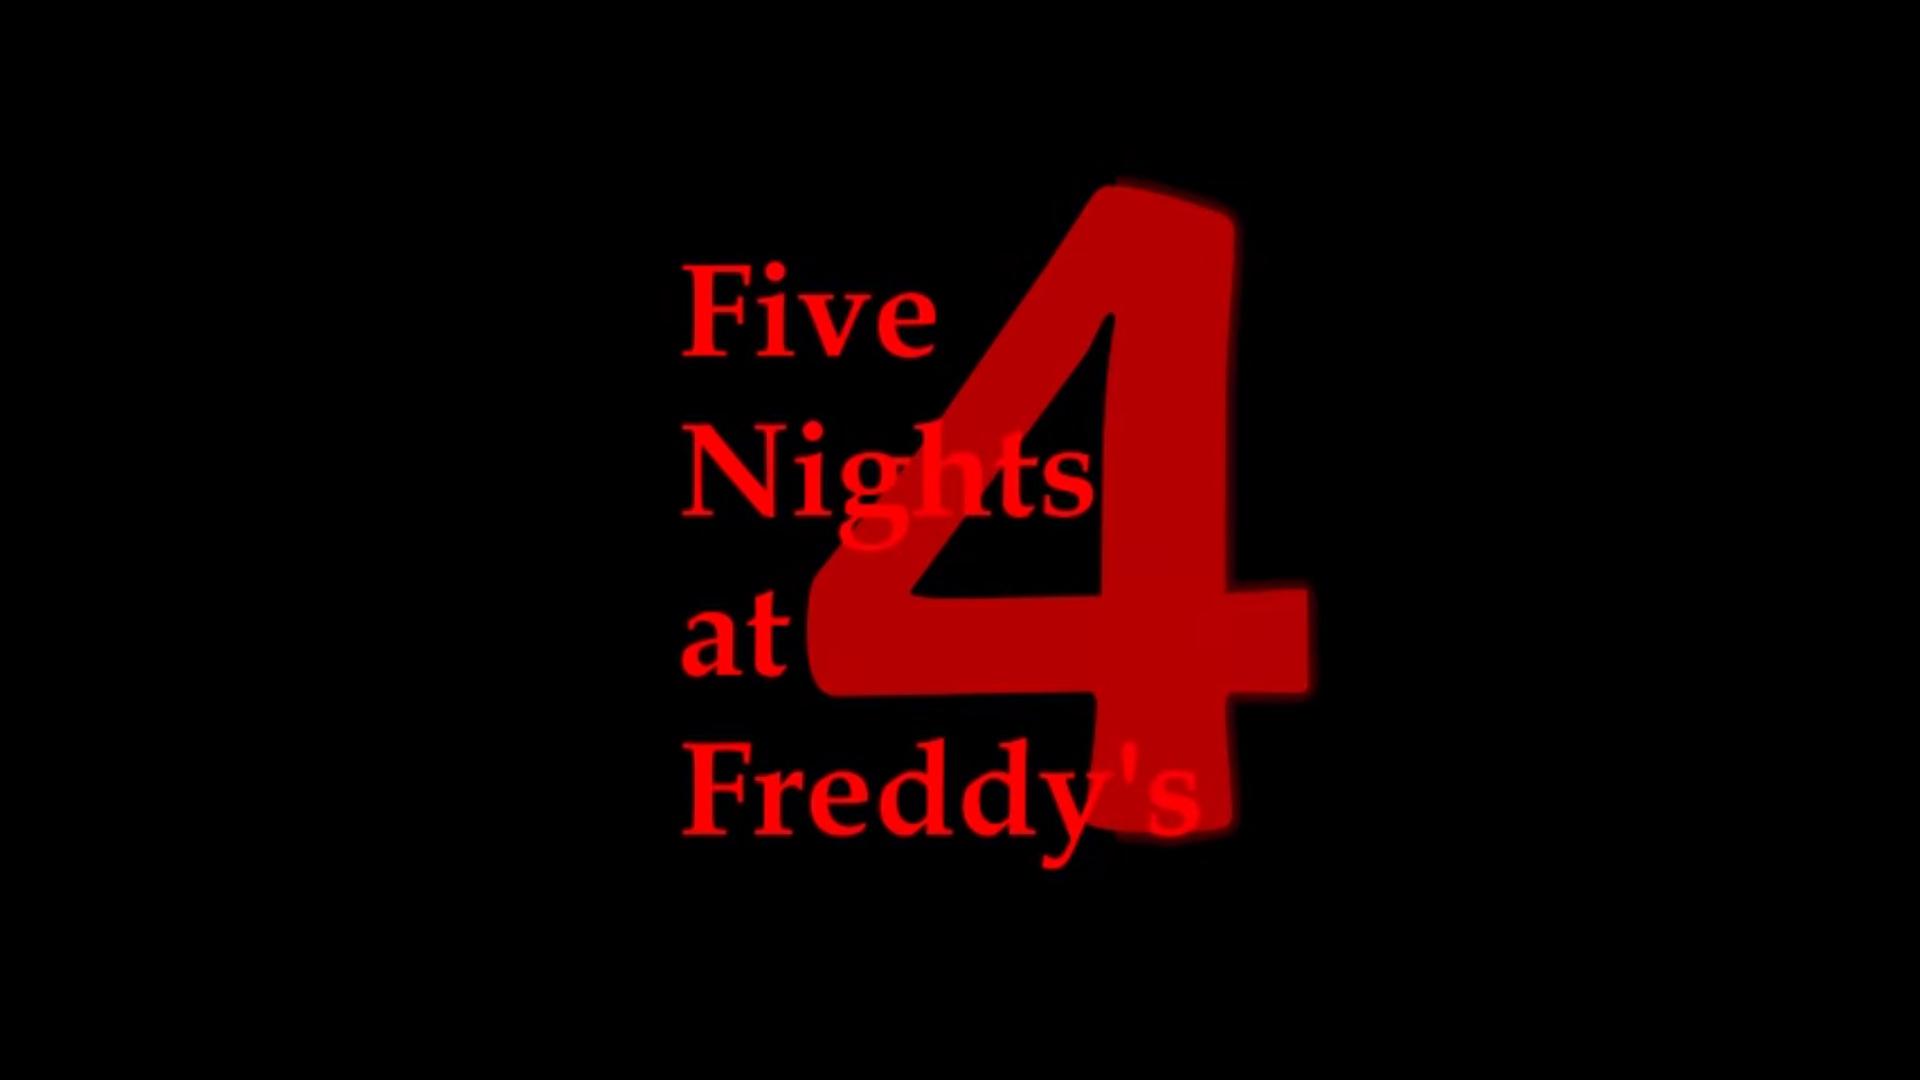 Five Night at Freddies (2)